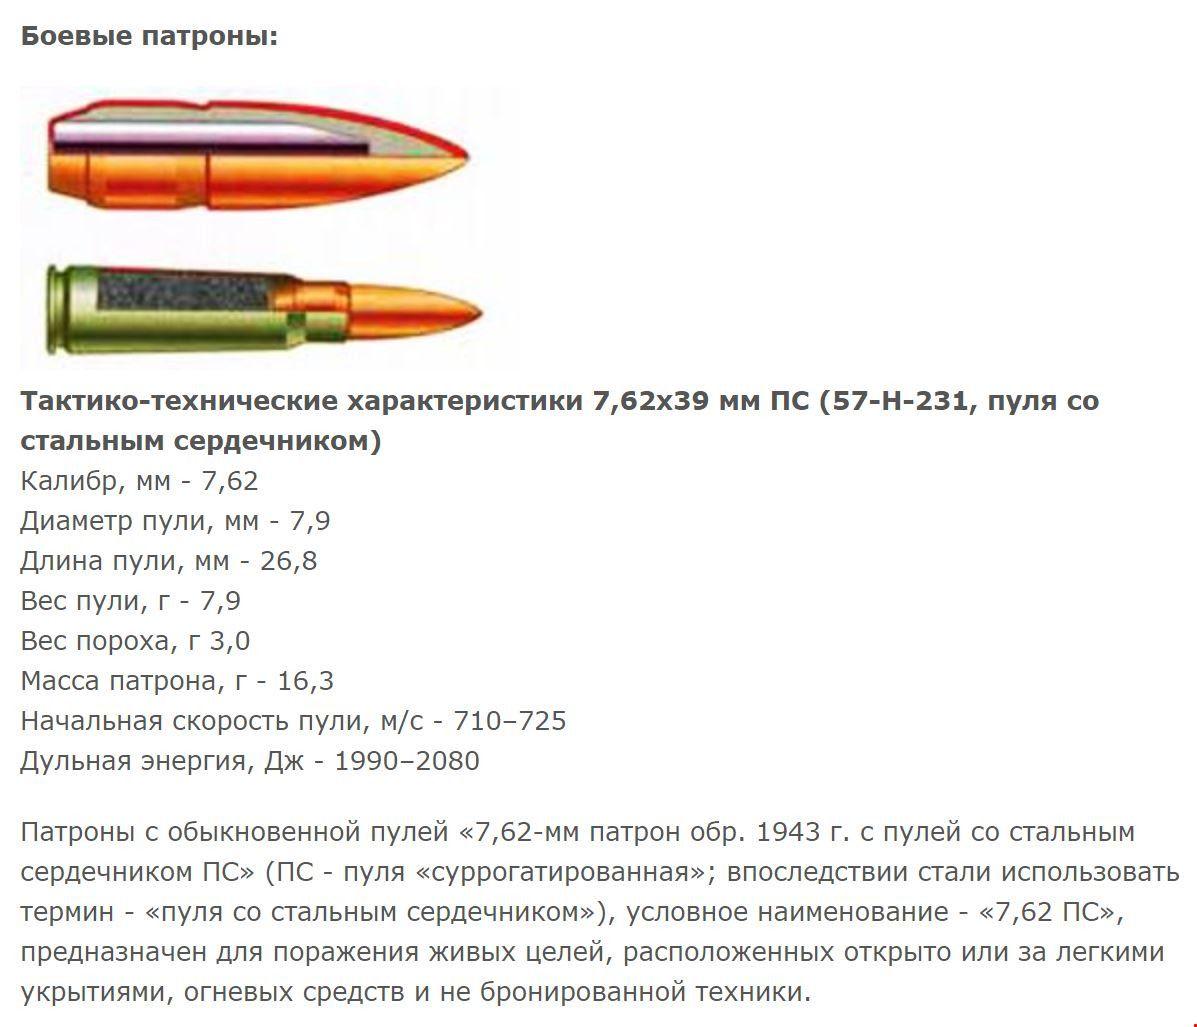 ?url=https%3A%2F%2Fsite.ua%2Fstorage%2F124542%2Fps